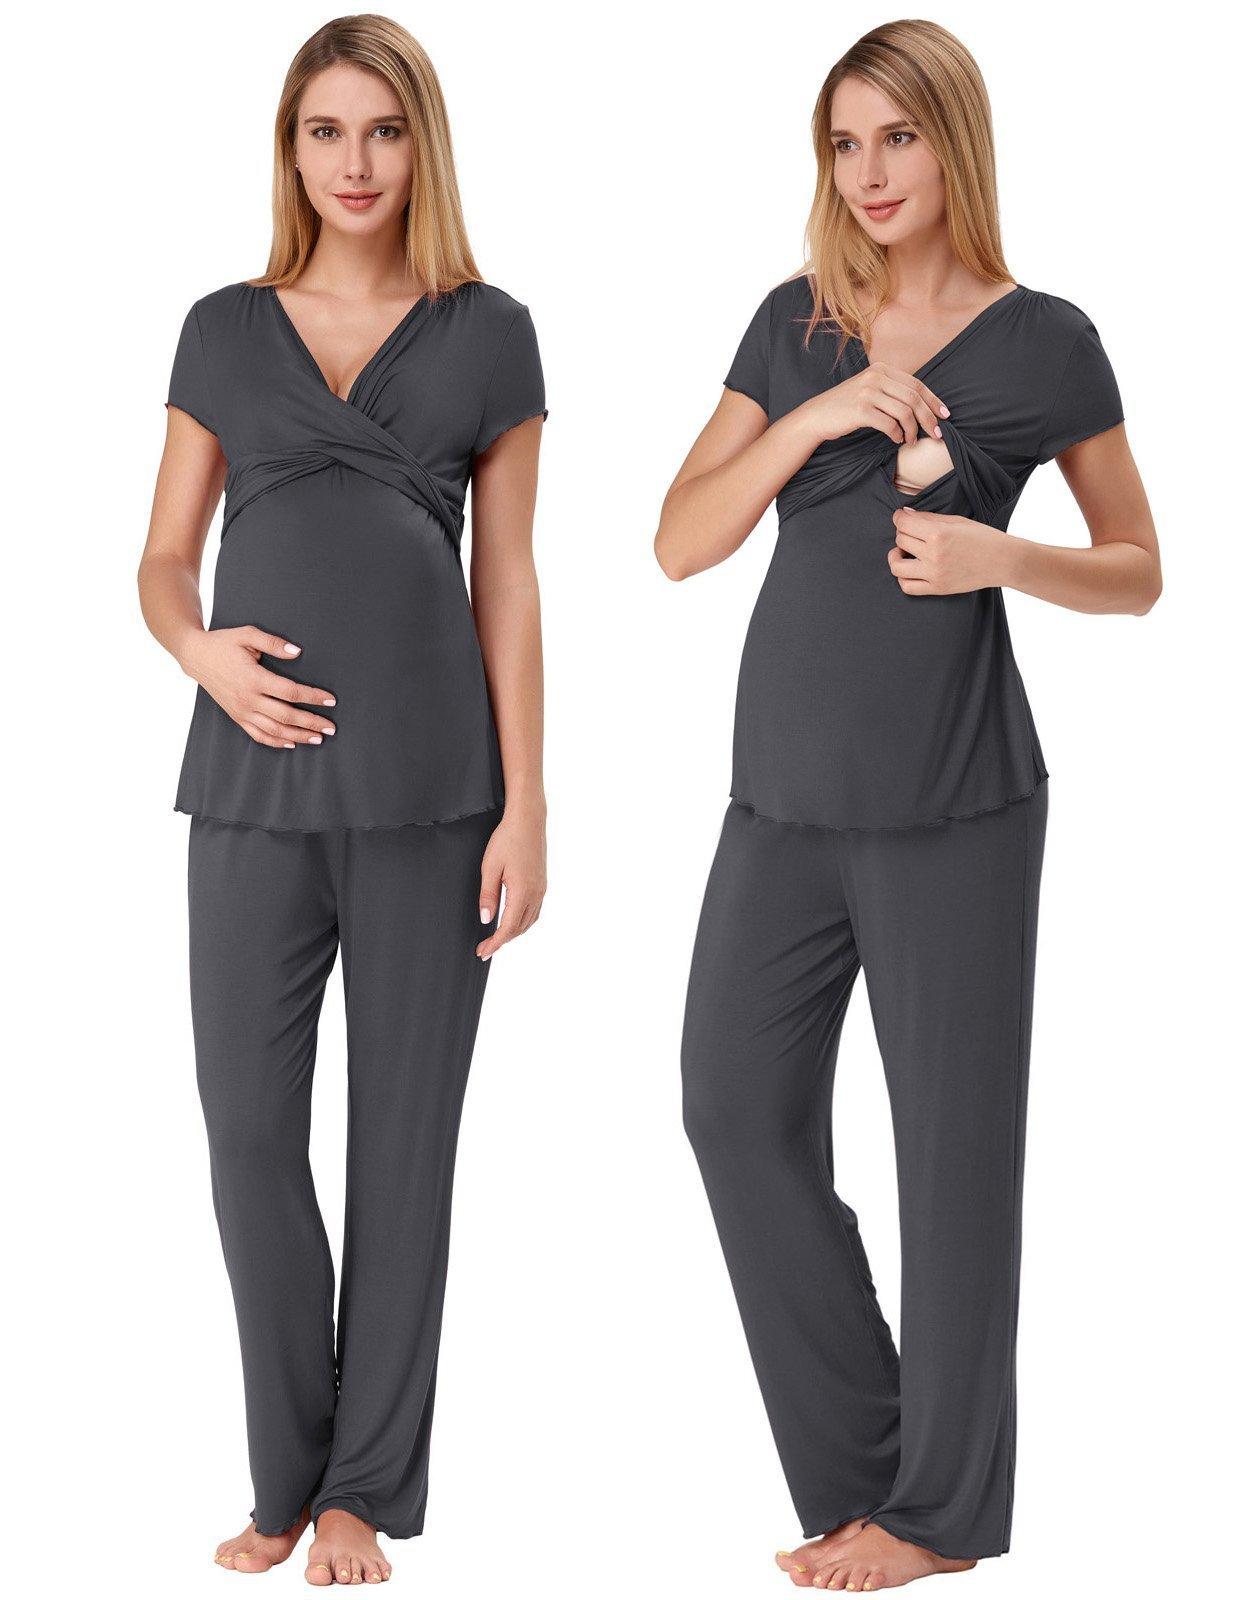 Cozy Pajamas for New Mom Stretchy Nursing Set Loungewear for Fall Dark Grey S ZE45-5